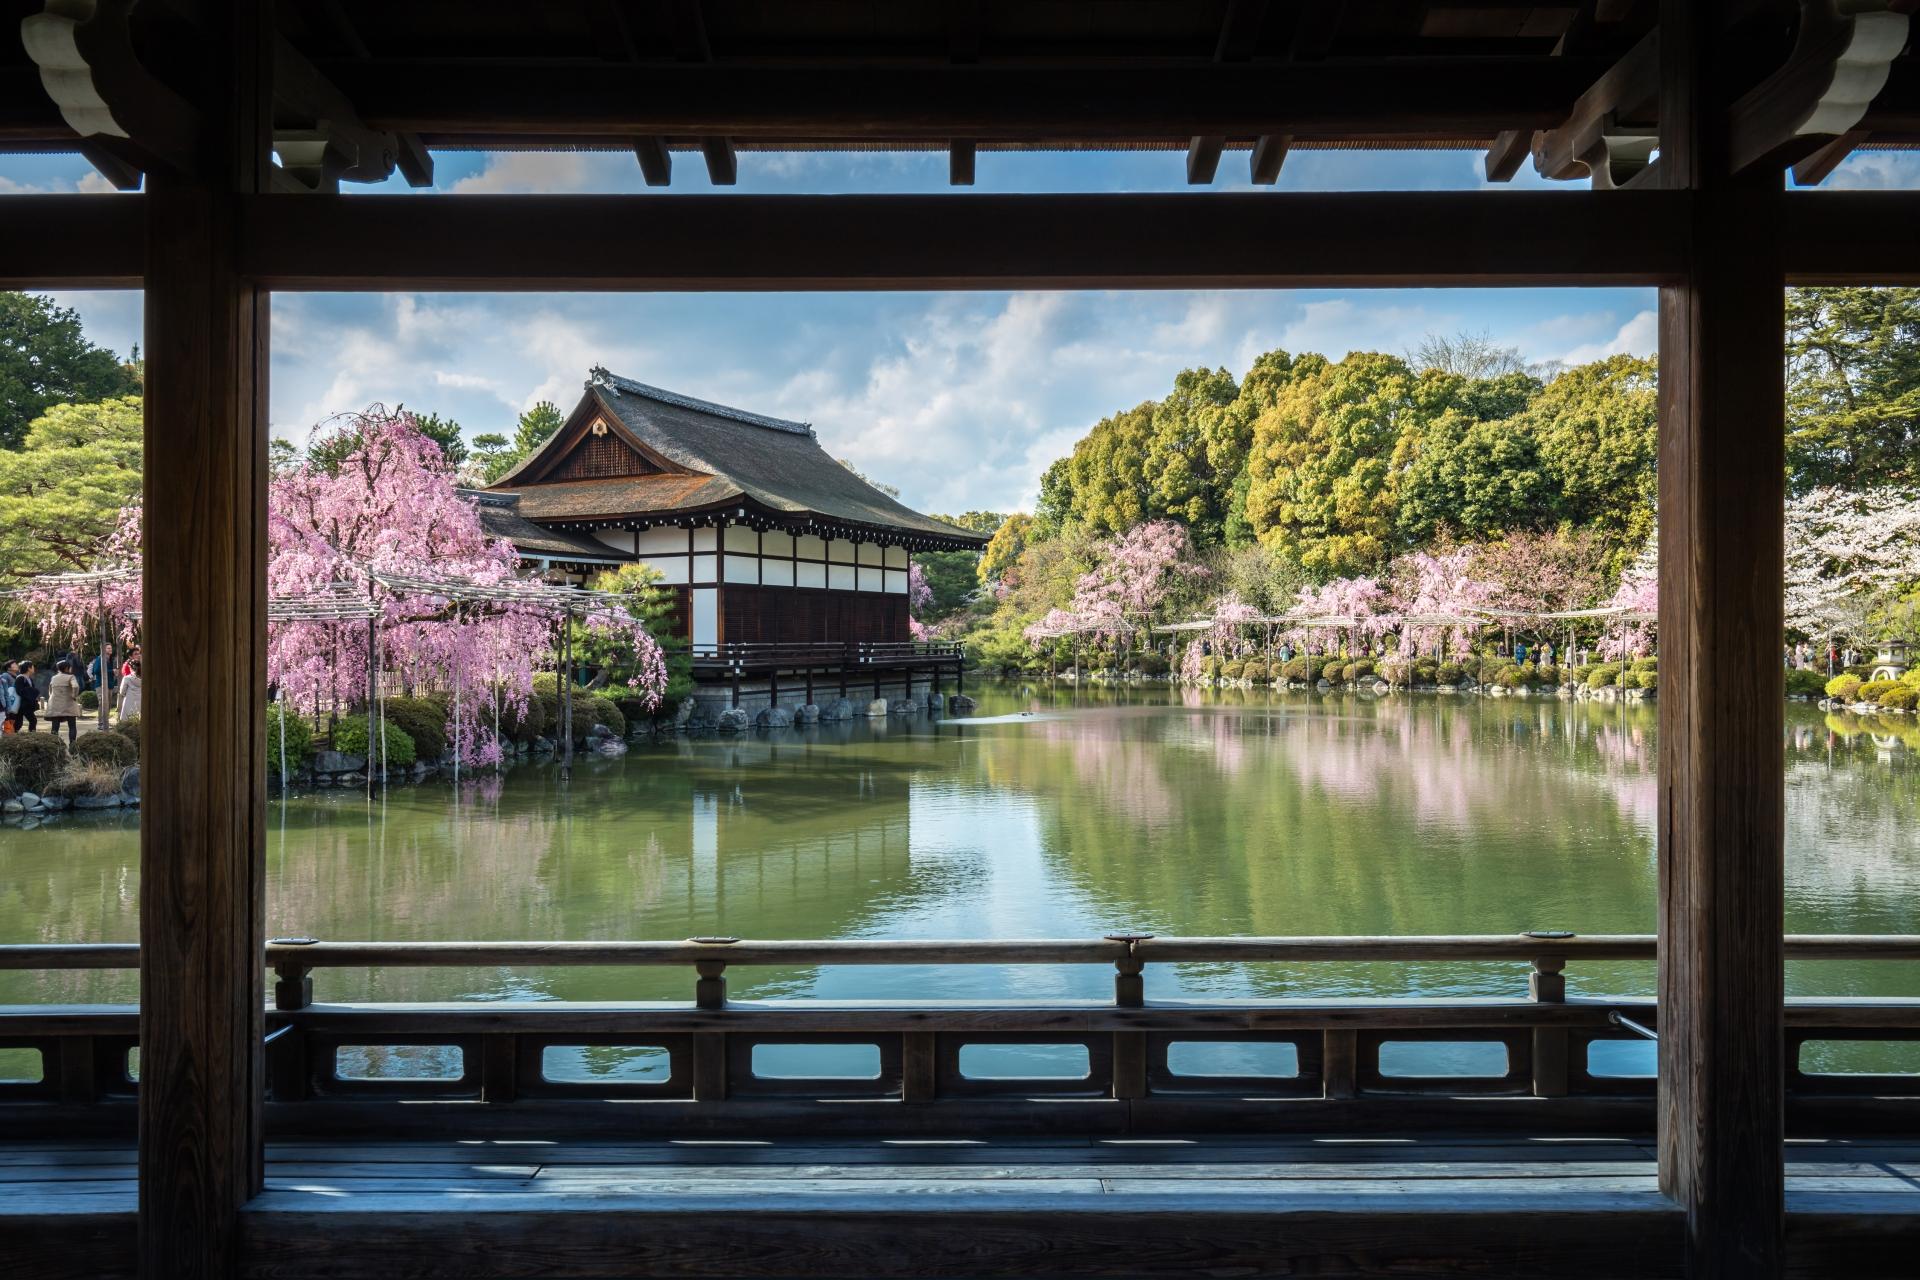 3963409_m 京都府 平安神宮(水面に映る桜の景色が美しい春におすすめ桜写真スポット! 撮影した写真の紹介、アクセス情報など)